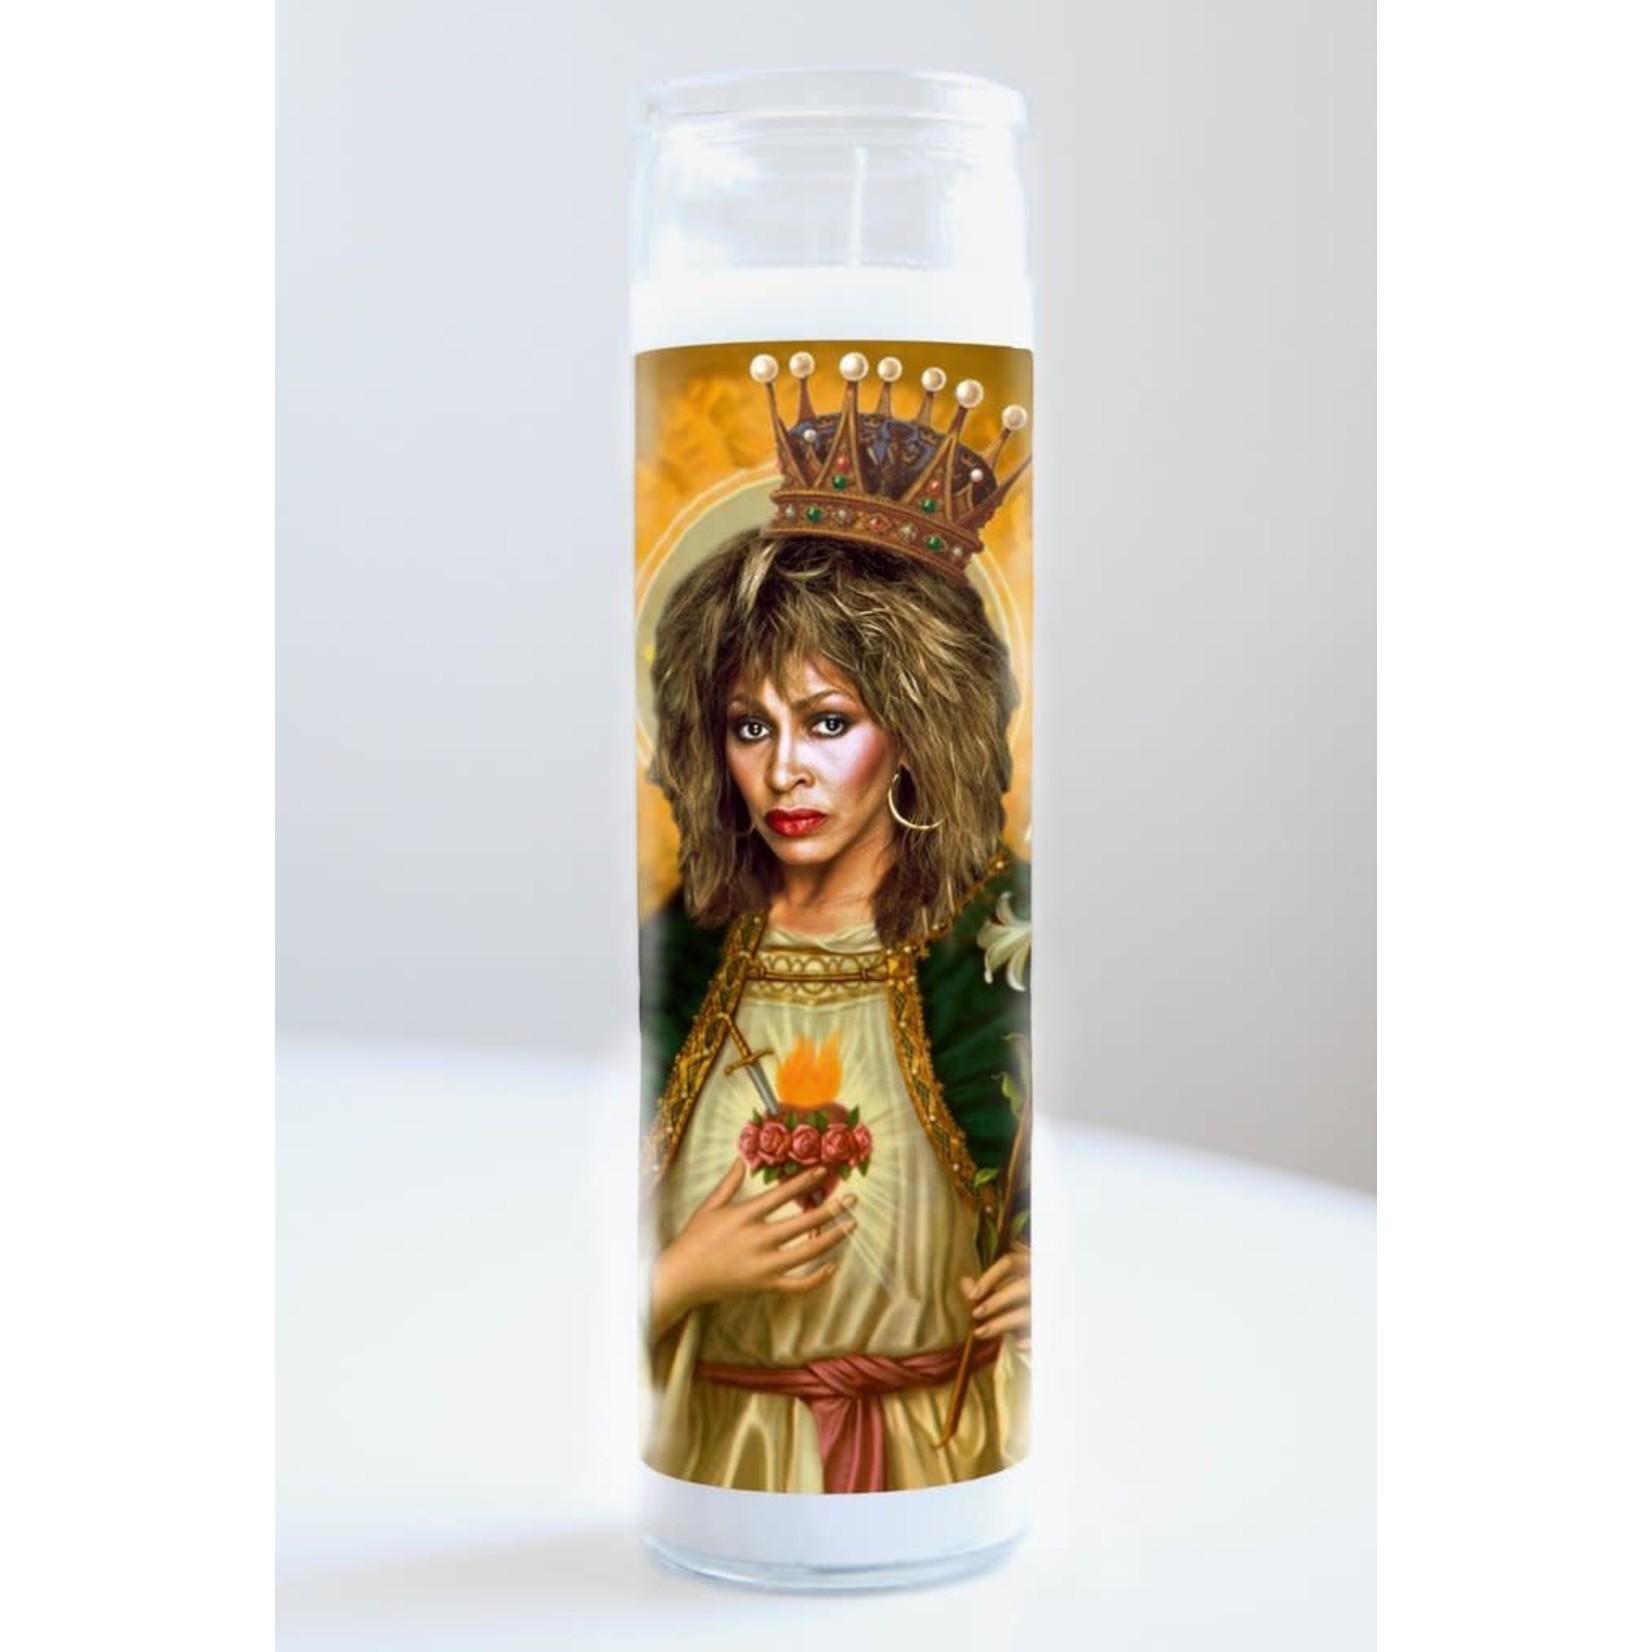 Candle - Tina Turner